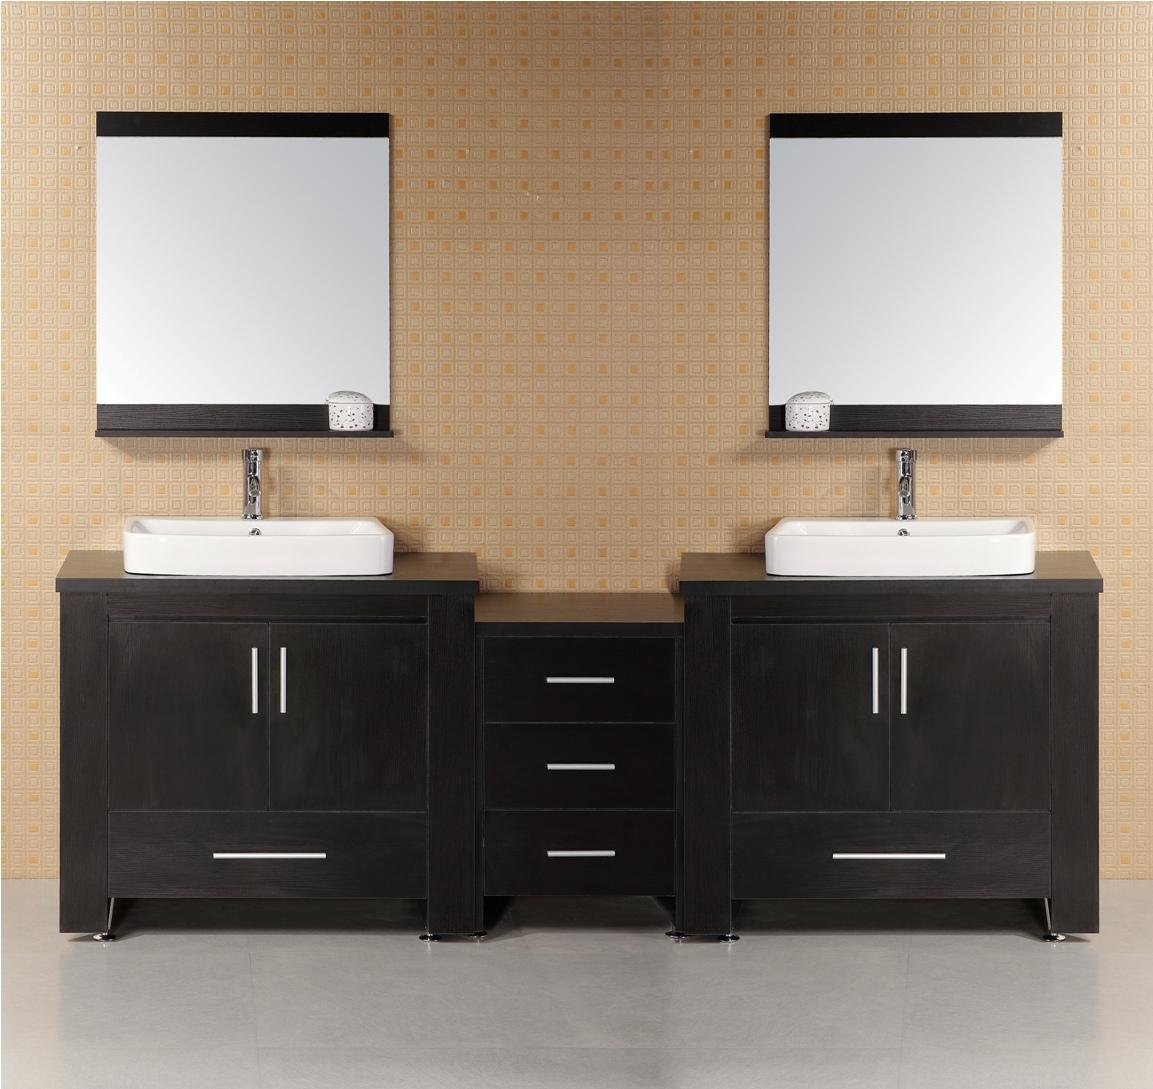 narrow double sink bathroom vanity.  96inch Shiva Vanity 96in Black Double